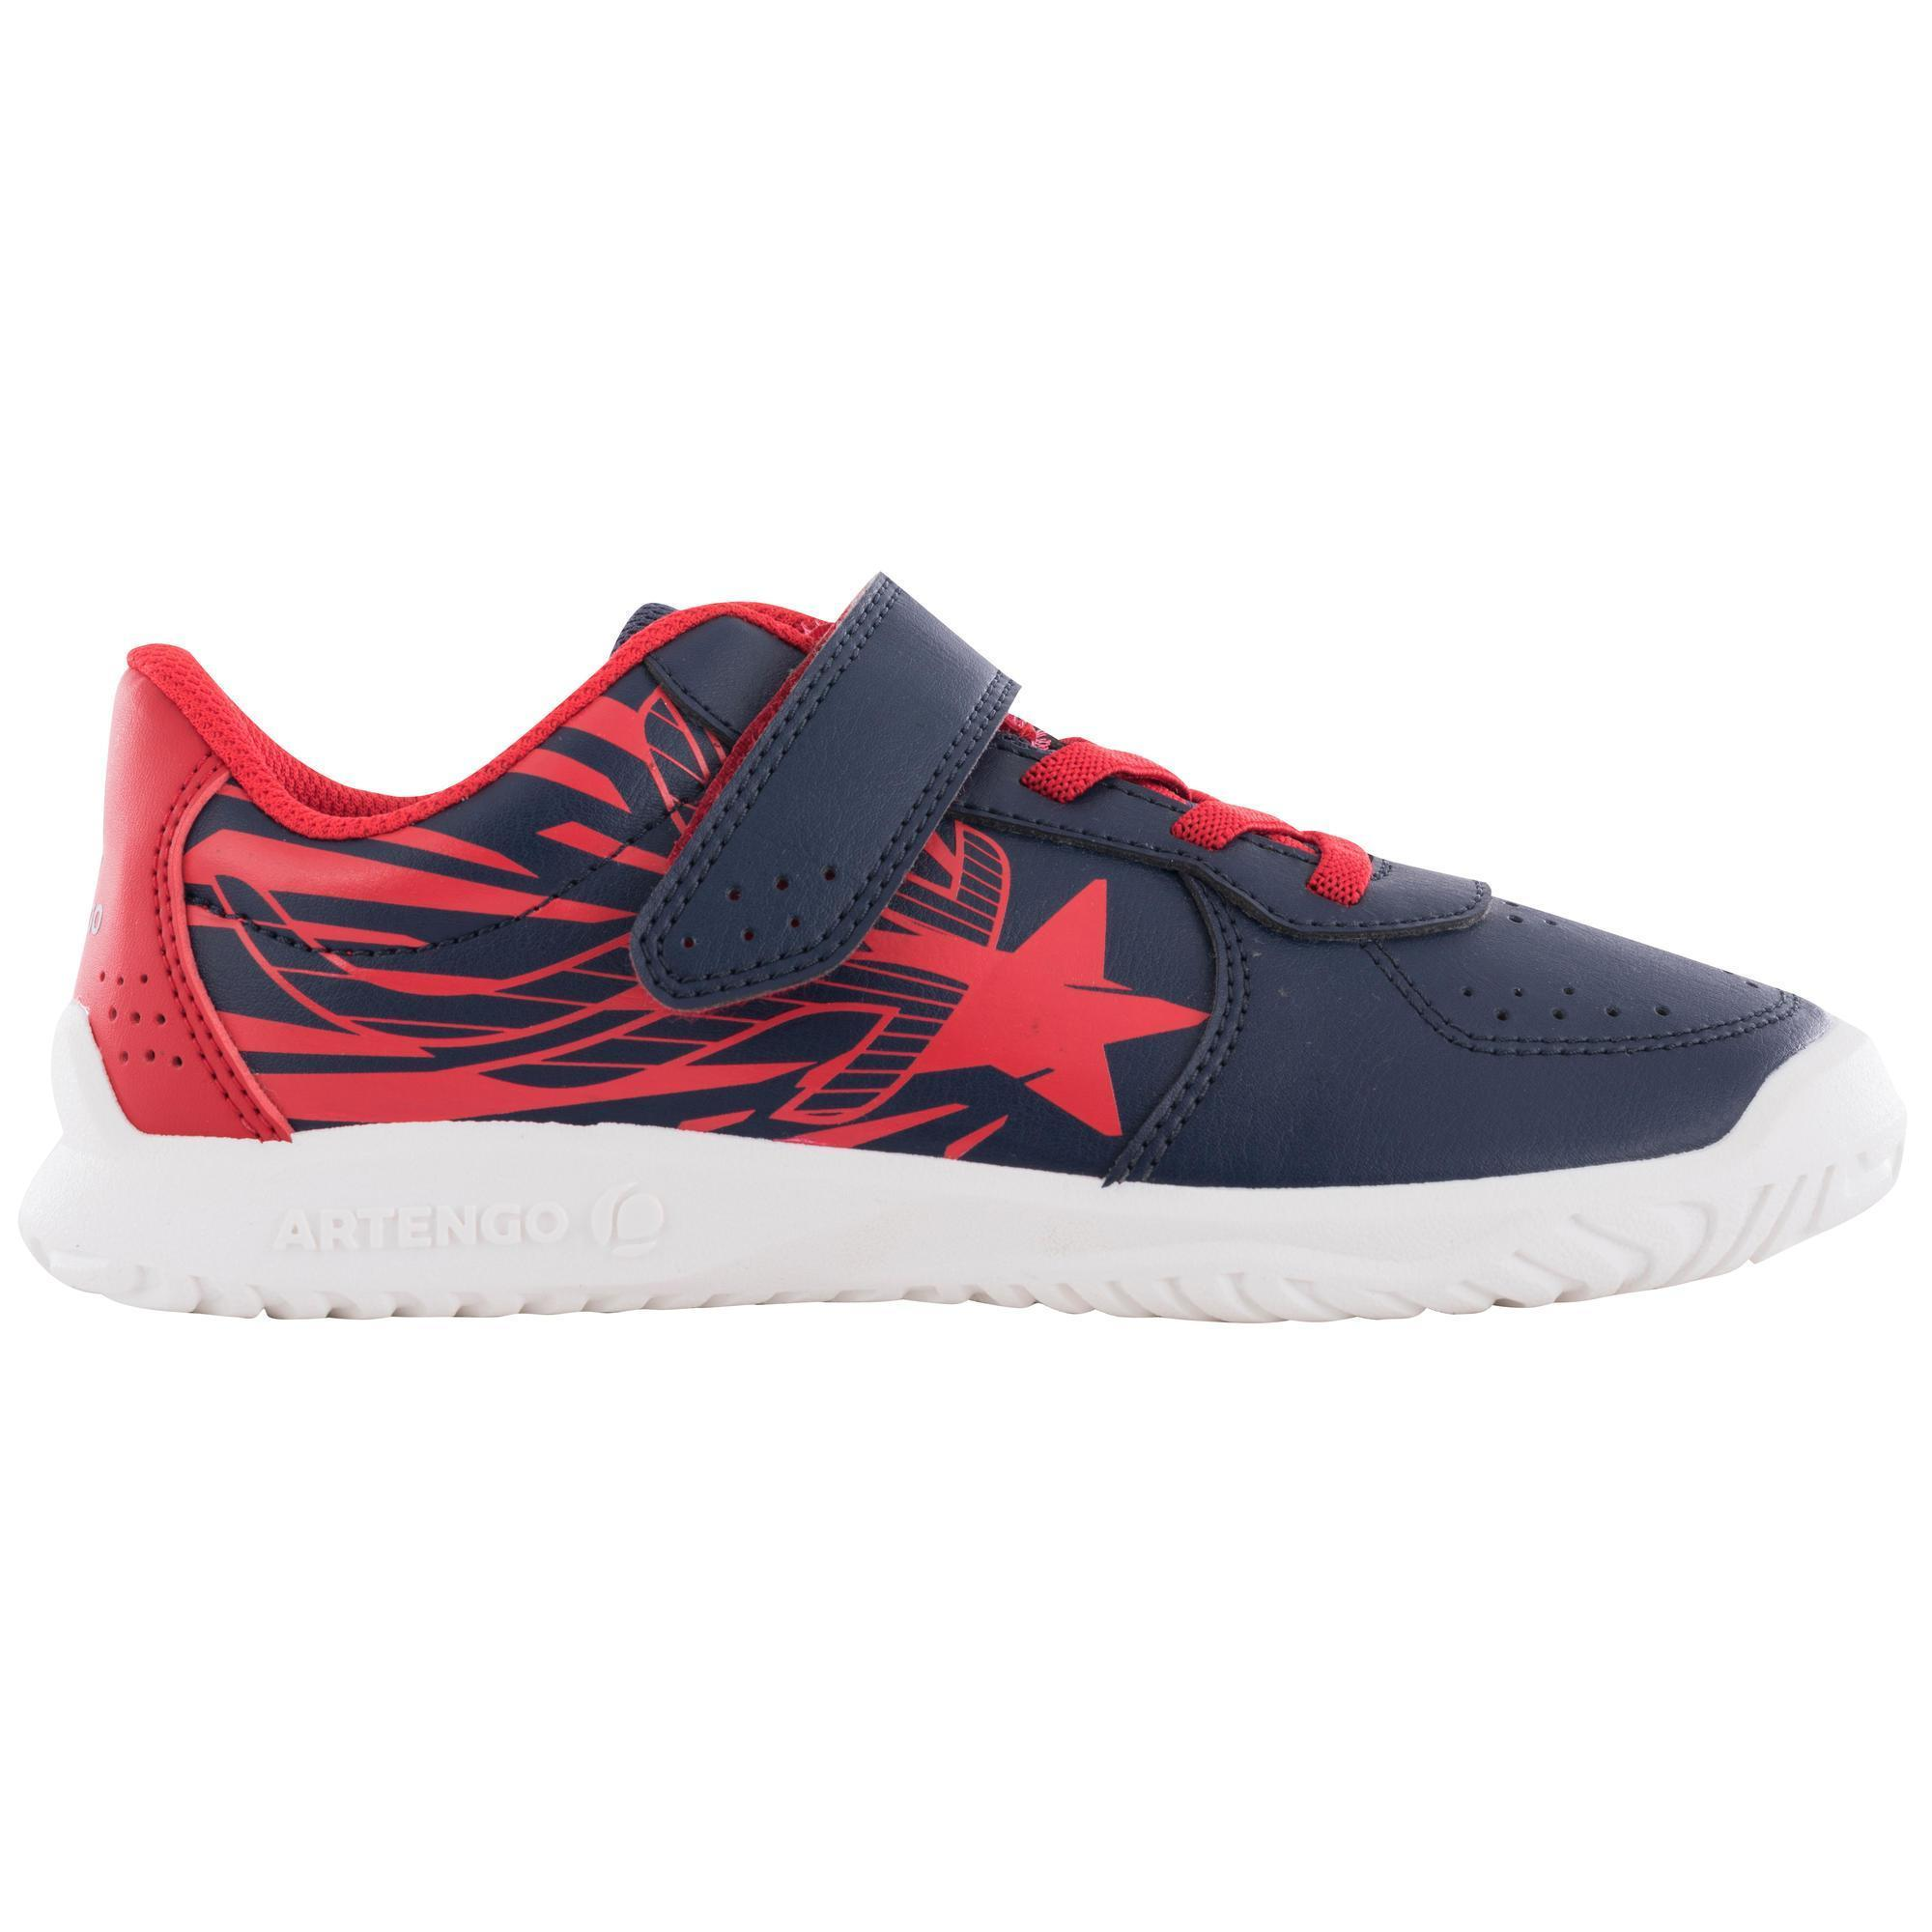 new concept 263f7 30ef7 chaussure tennis artengo